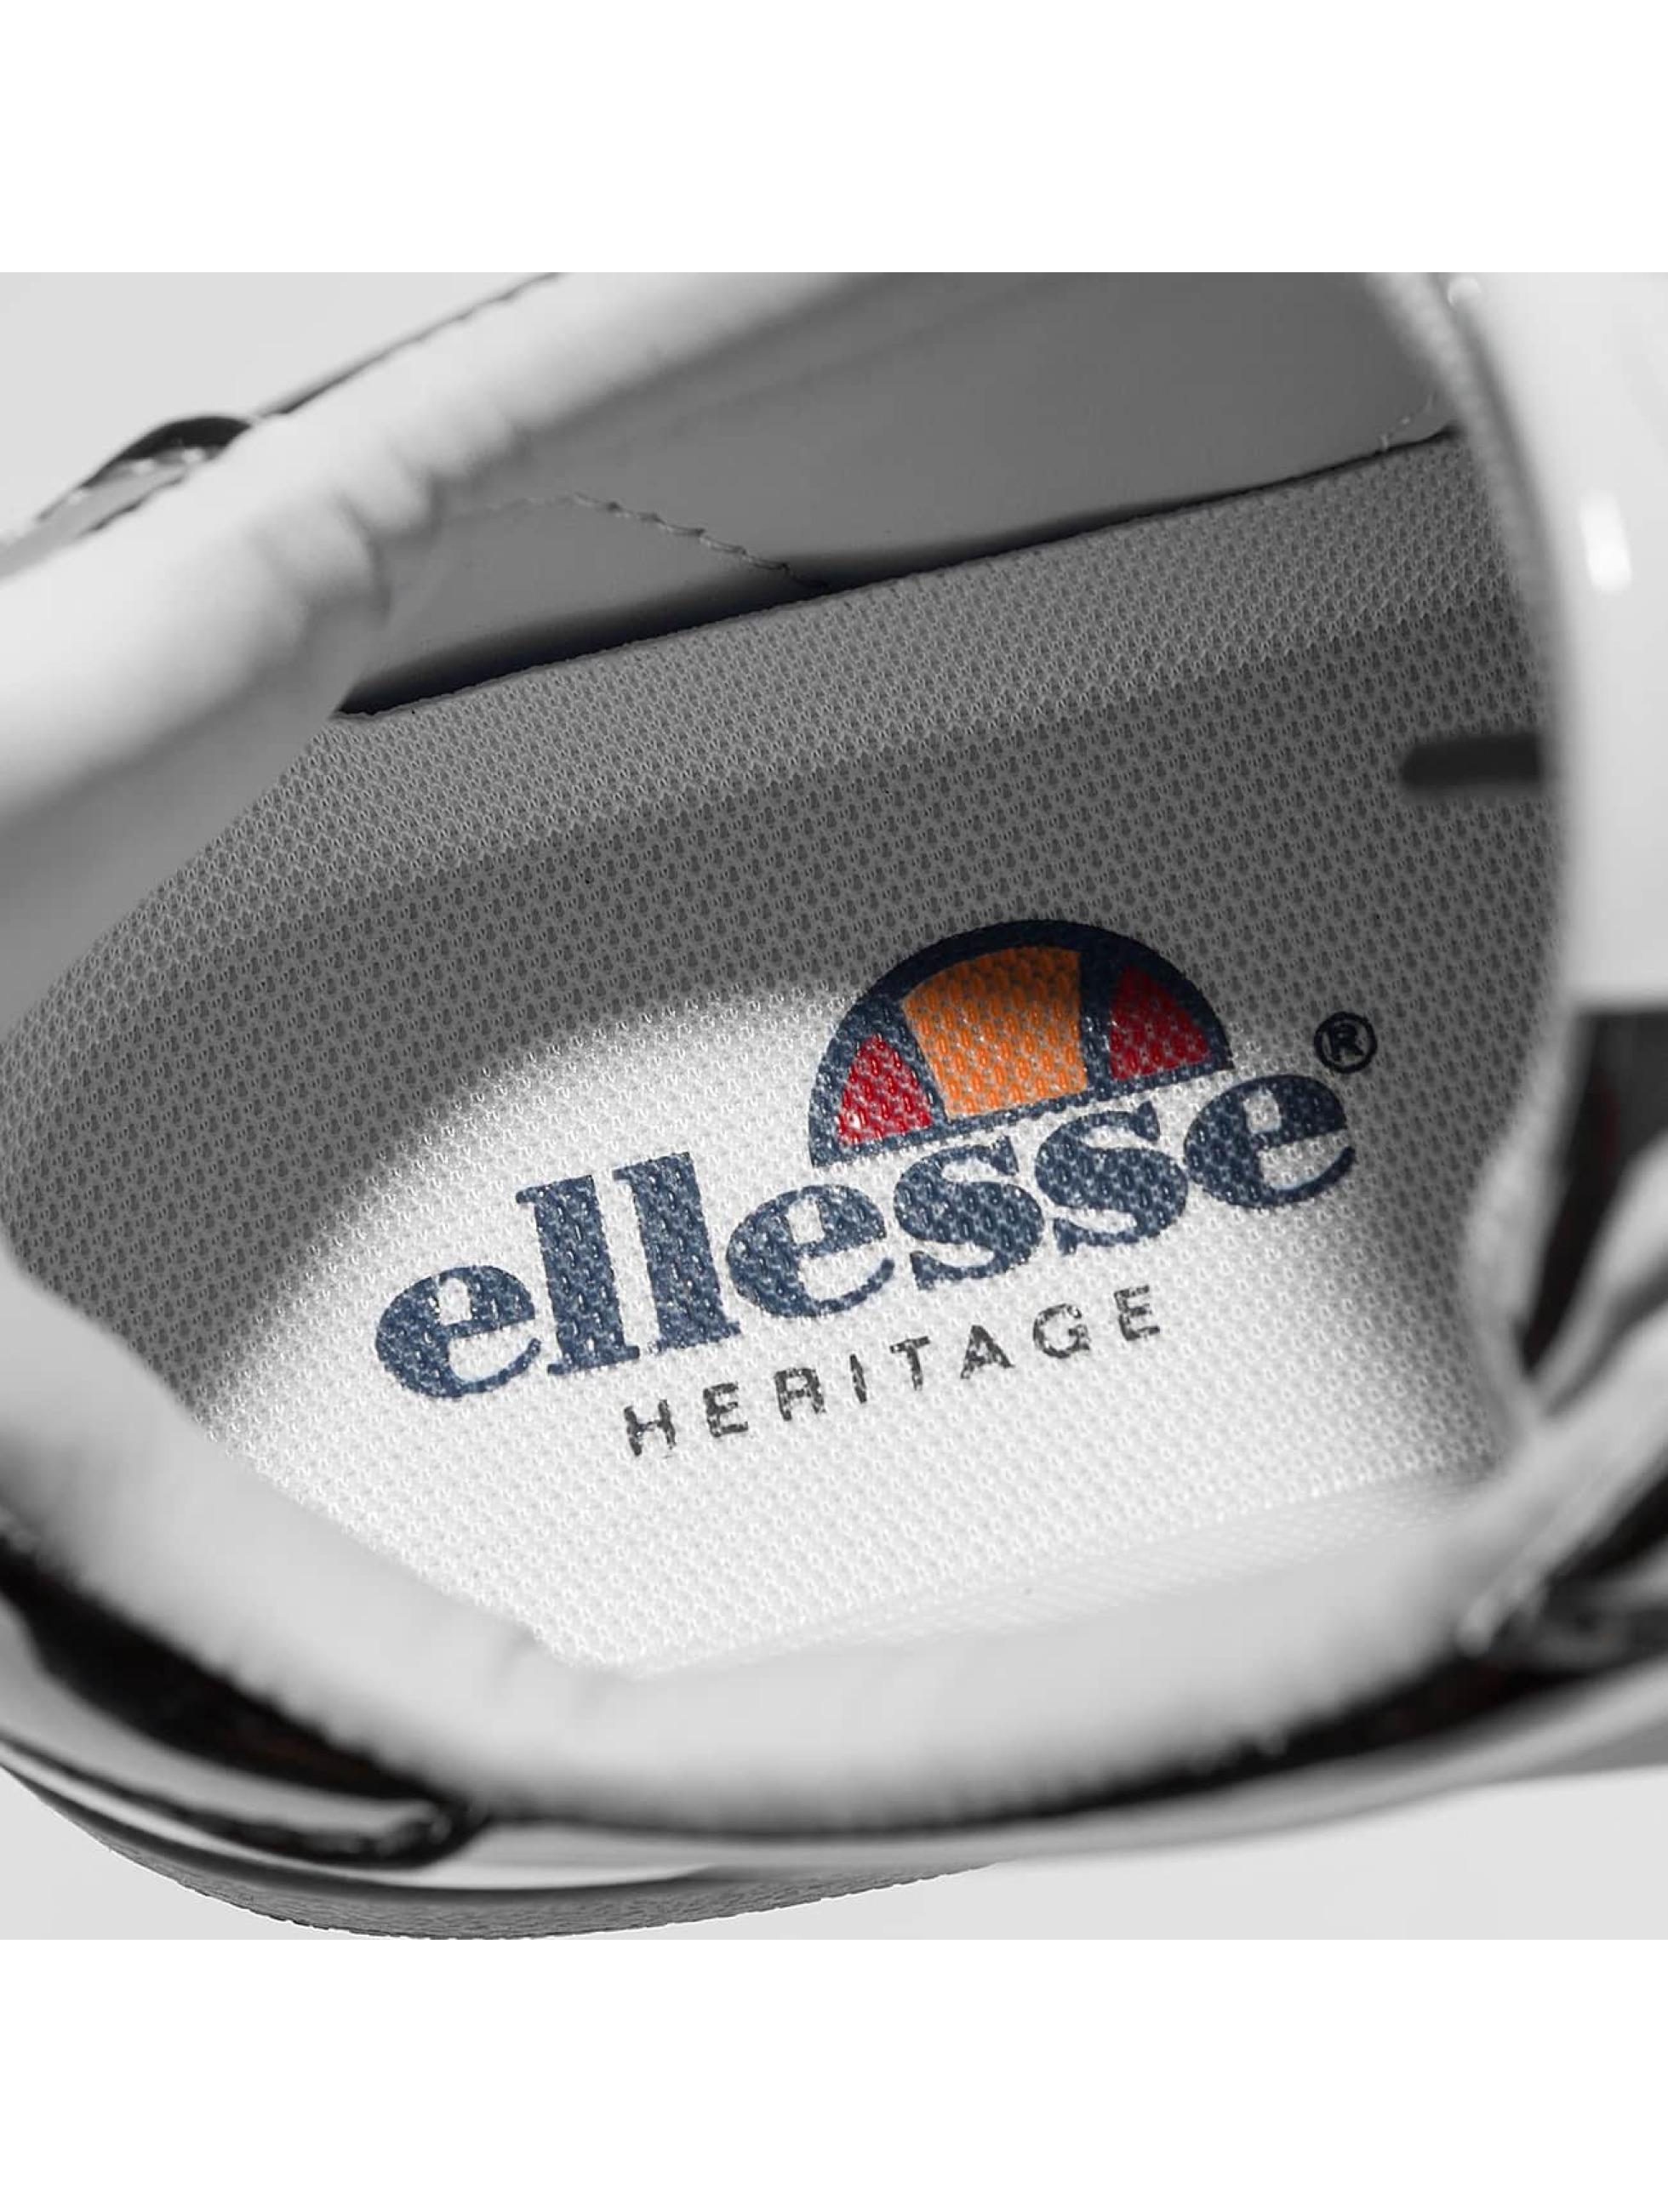 Ellesse Sneaker Heritage Anzia Metallic bianco